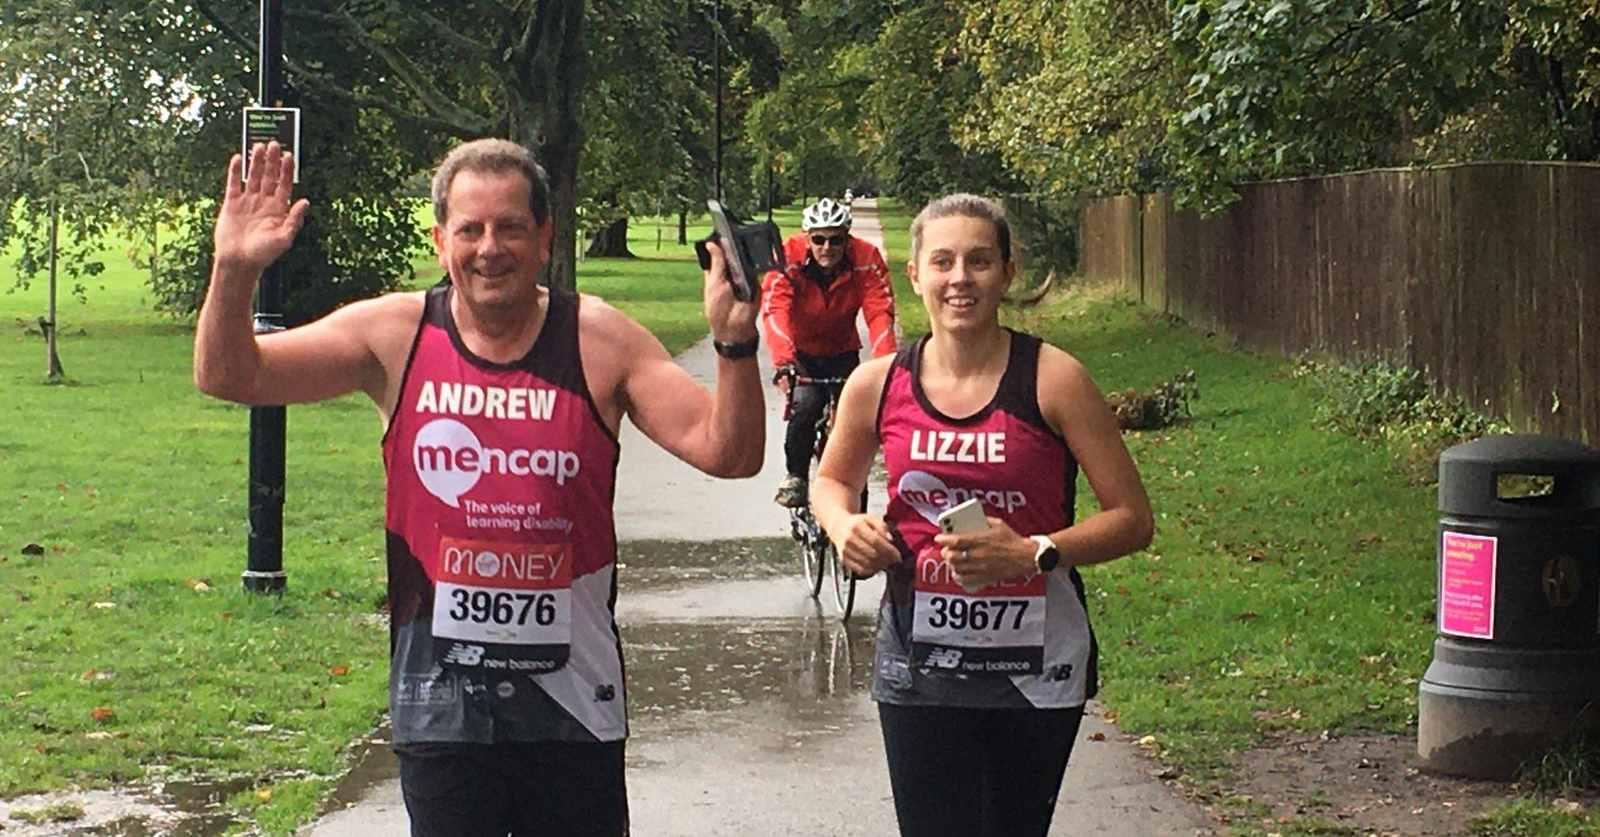 IMAGE GALLERY: Harrogate runs the London Marathon